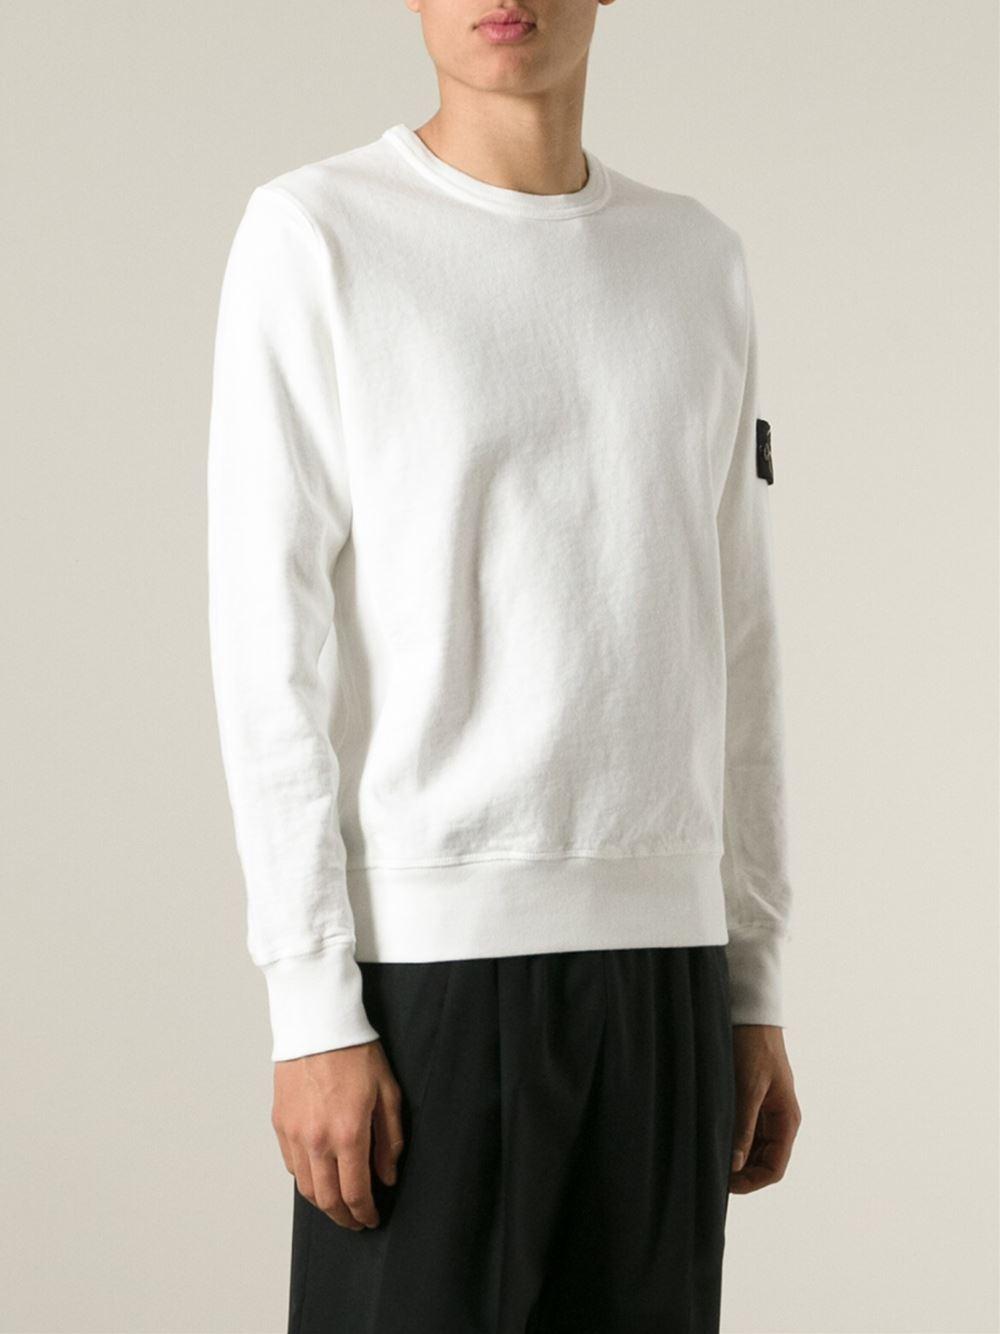 Stone island button sweater white dress